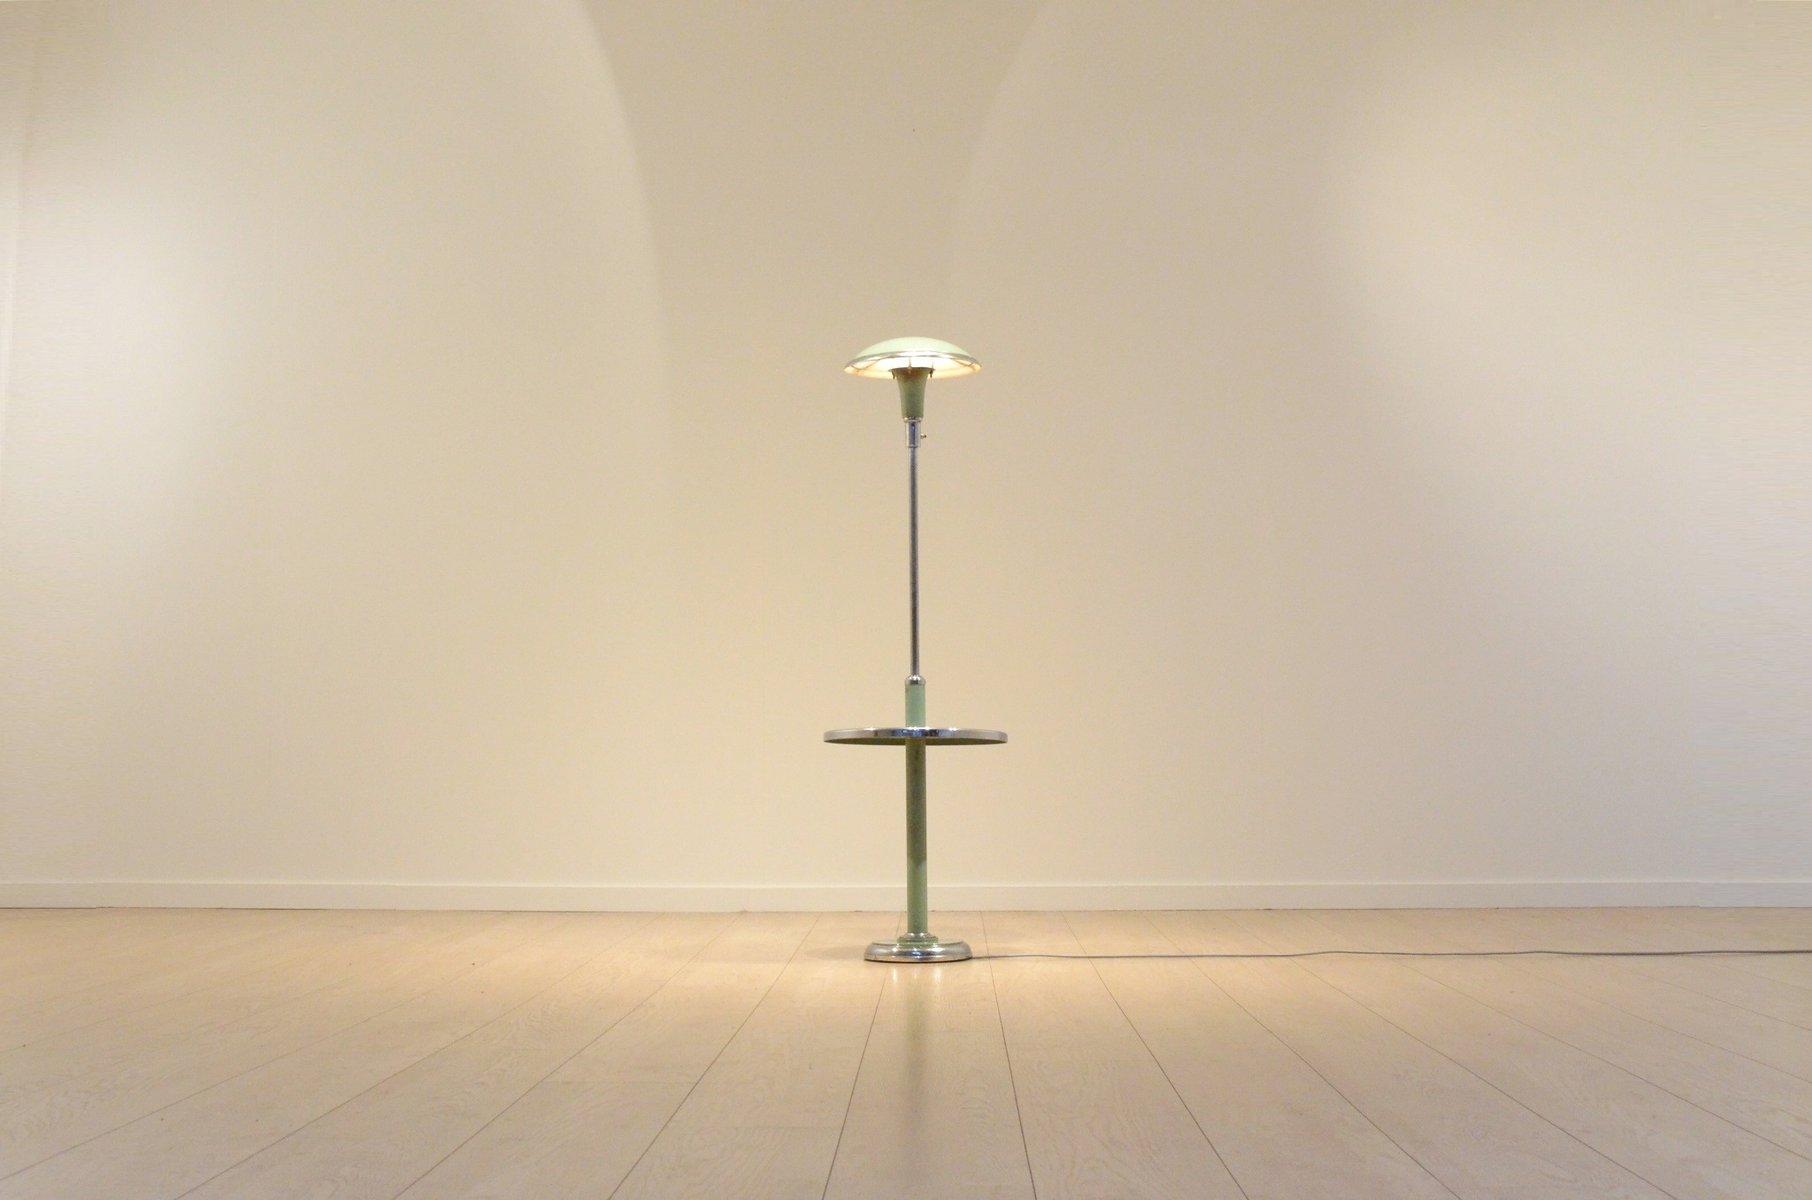 verstellbare bauhaus sellette stehlampe in pastellgr n und. Black Bedroom Furniture Sets. Home Design Ideas